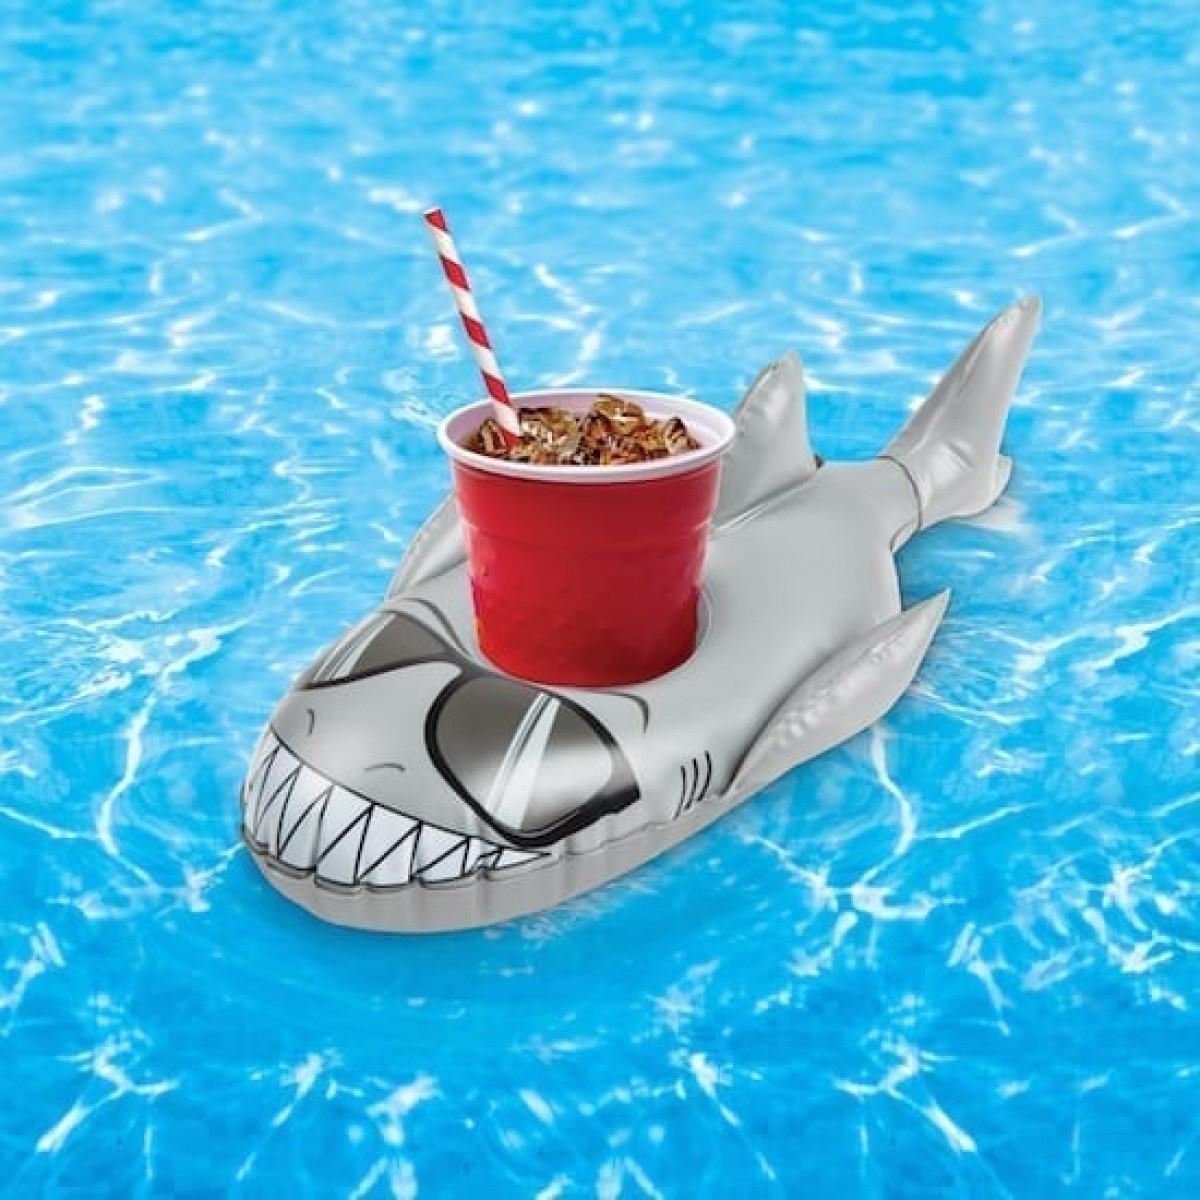 BMDF SH Sharks Beverage Boats Lifestyle RGB